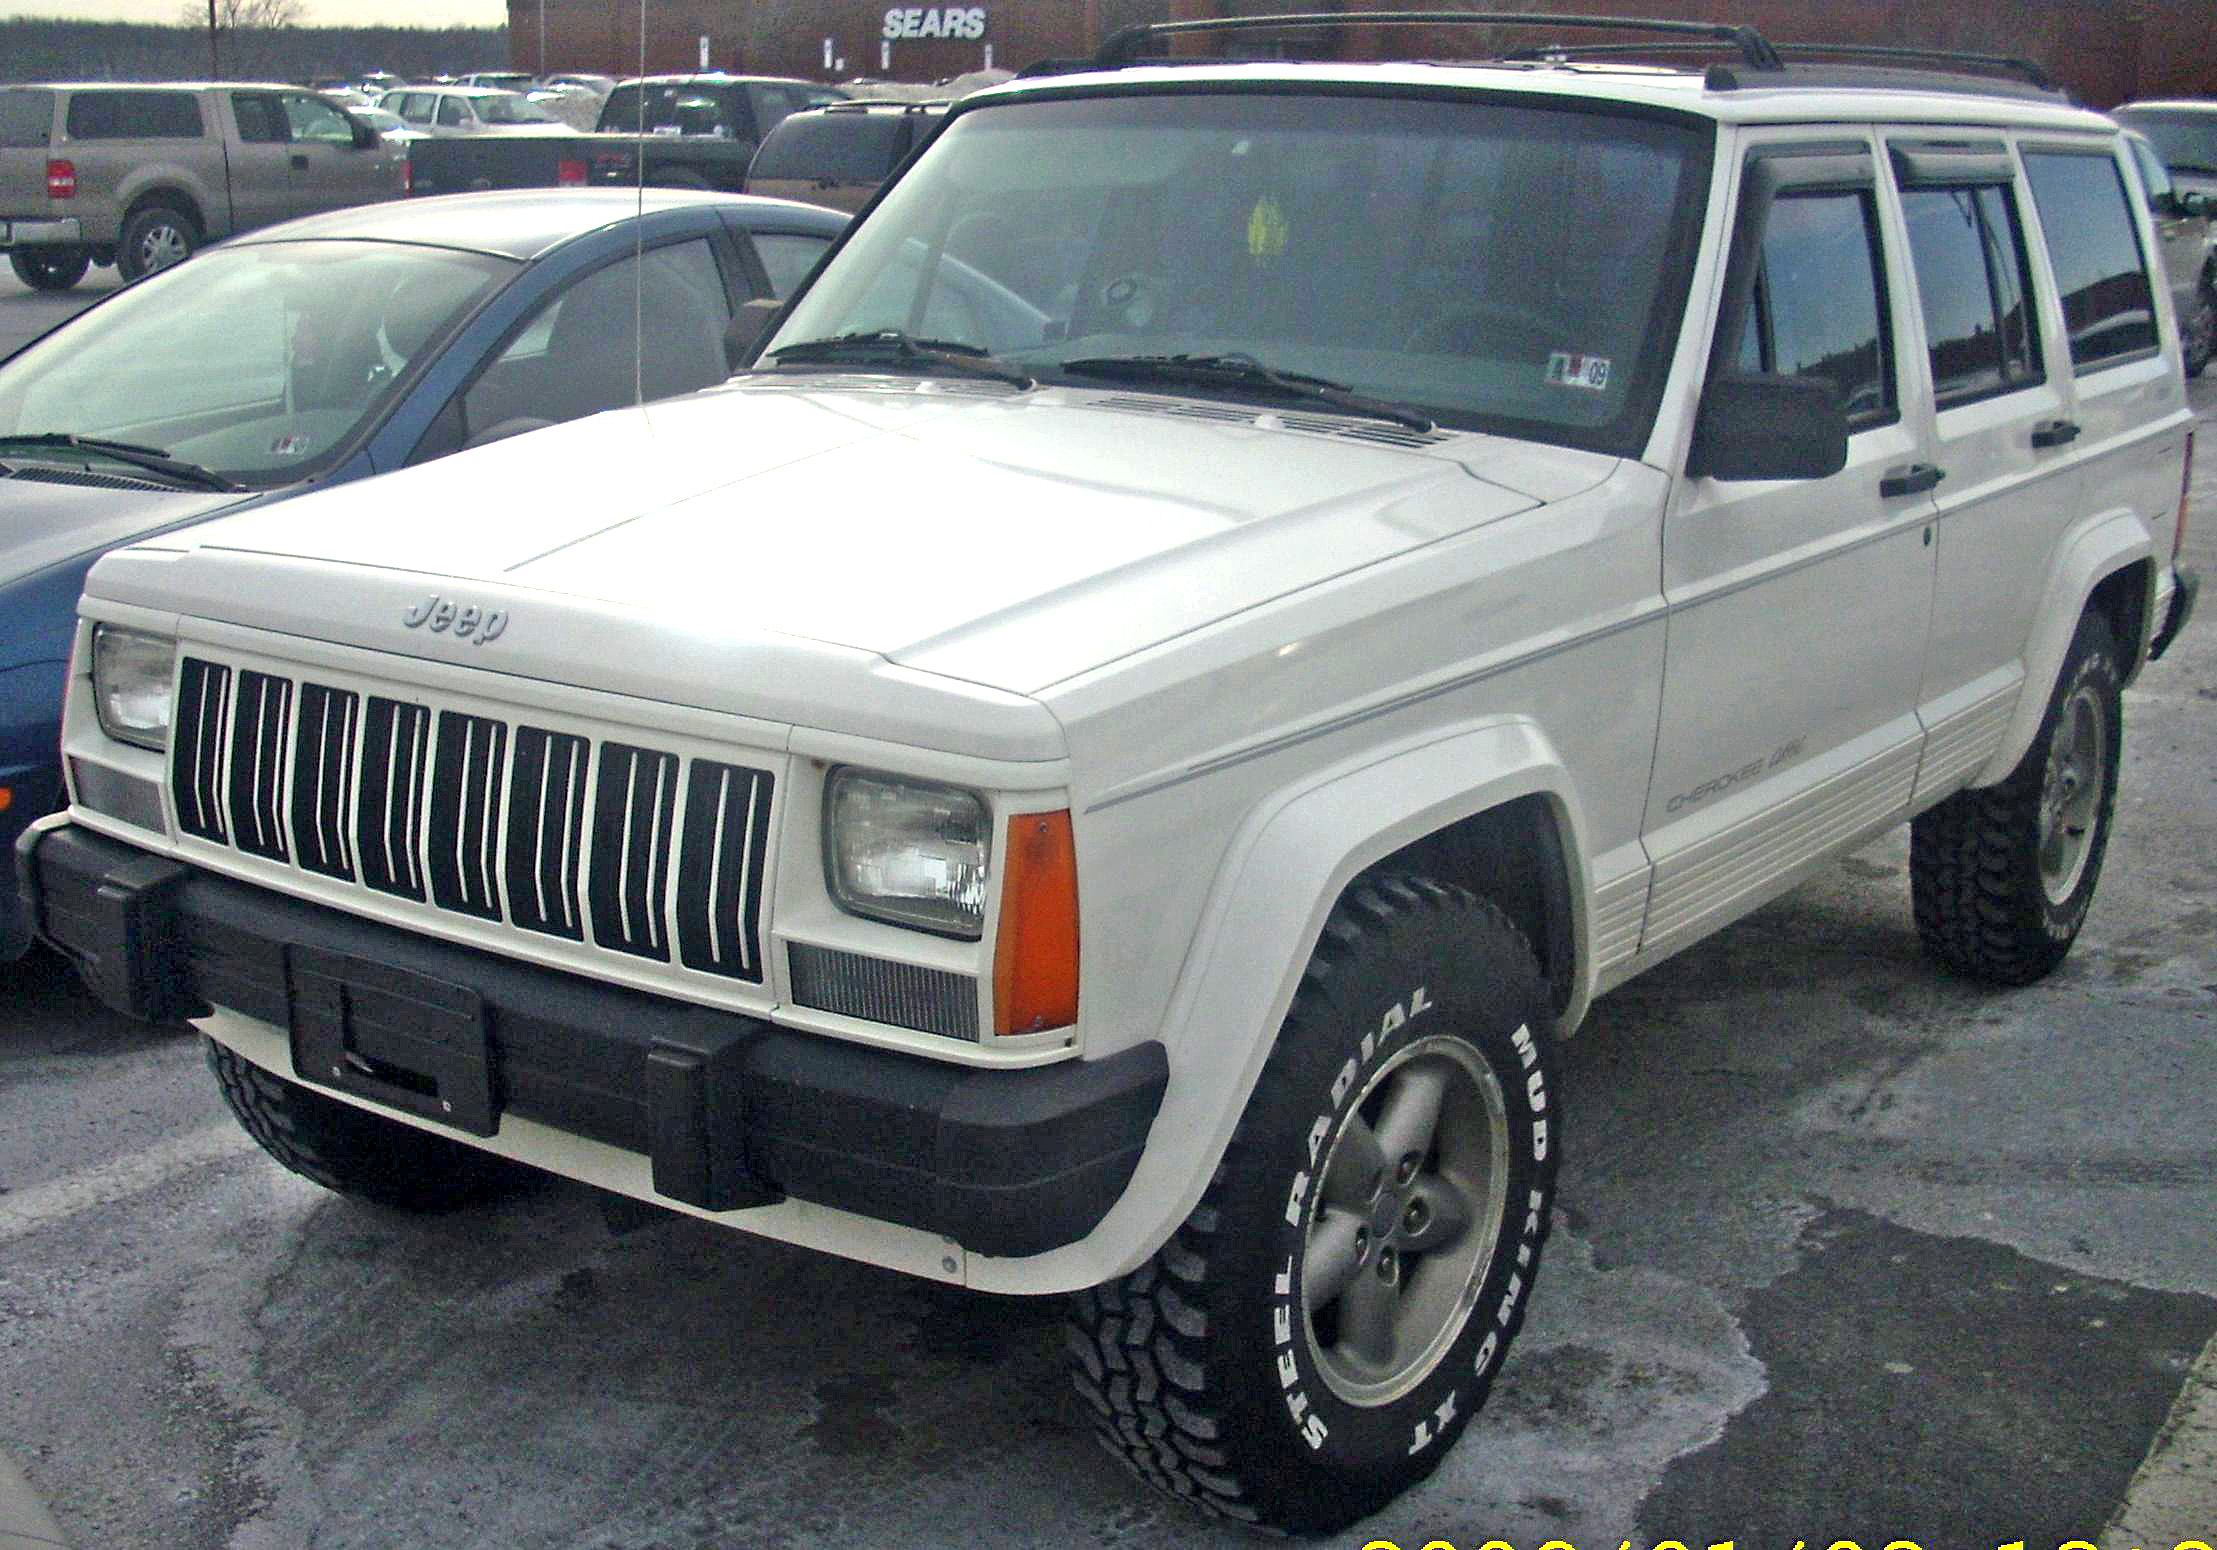 Jeep Cherokee Xj >> File:Jeep Cherokee Classic (XJ).JPG - Wikimedia Commons